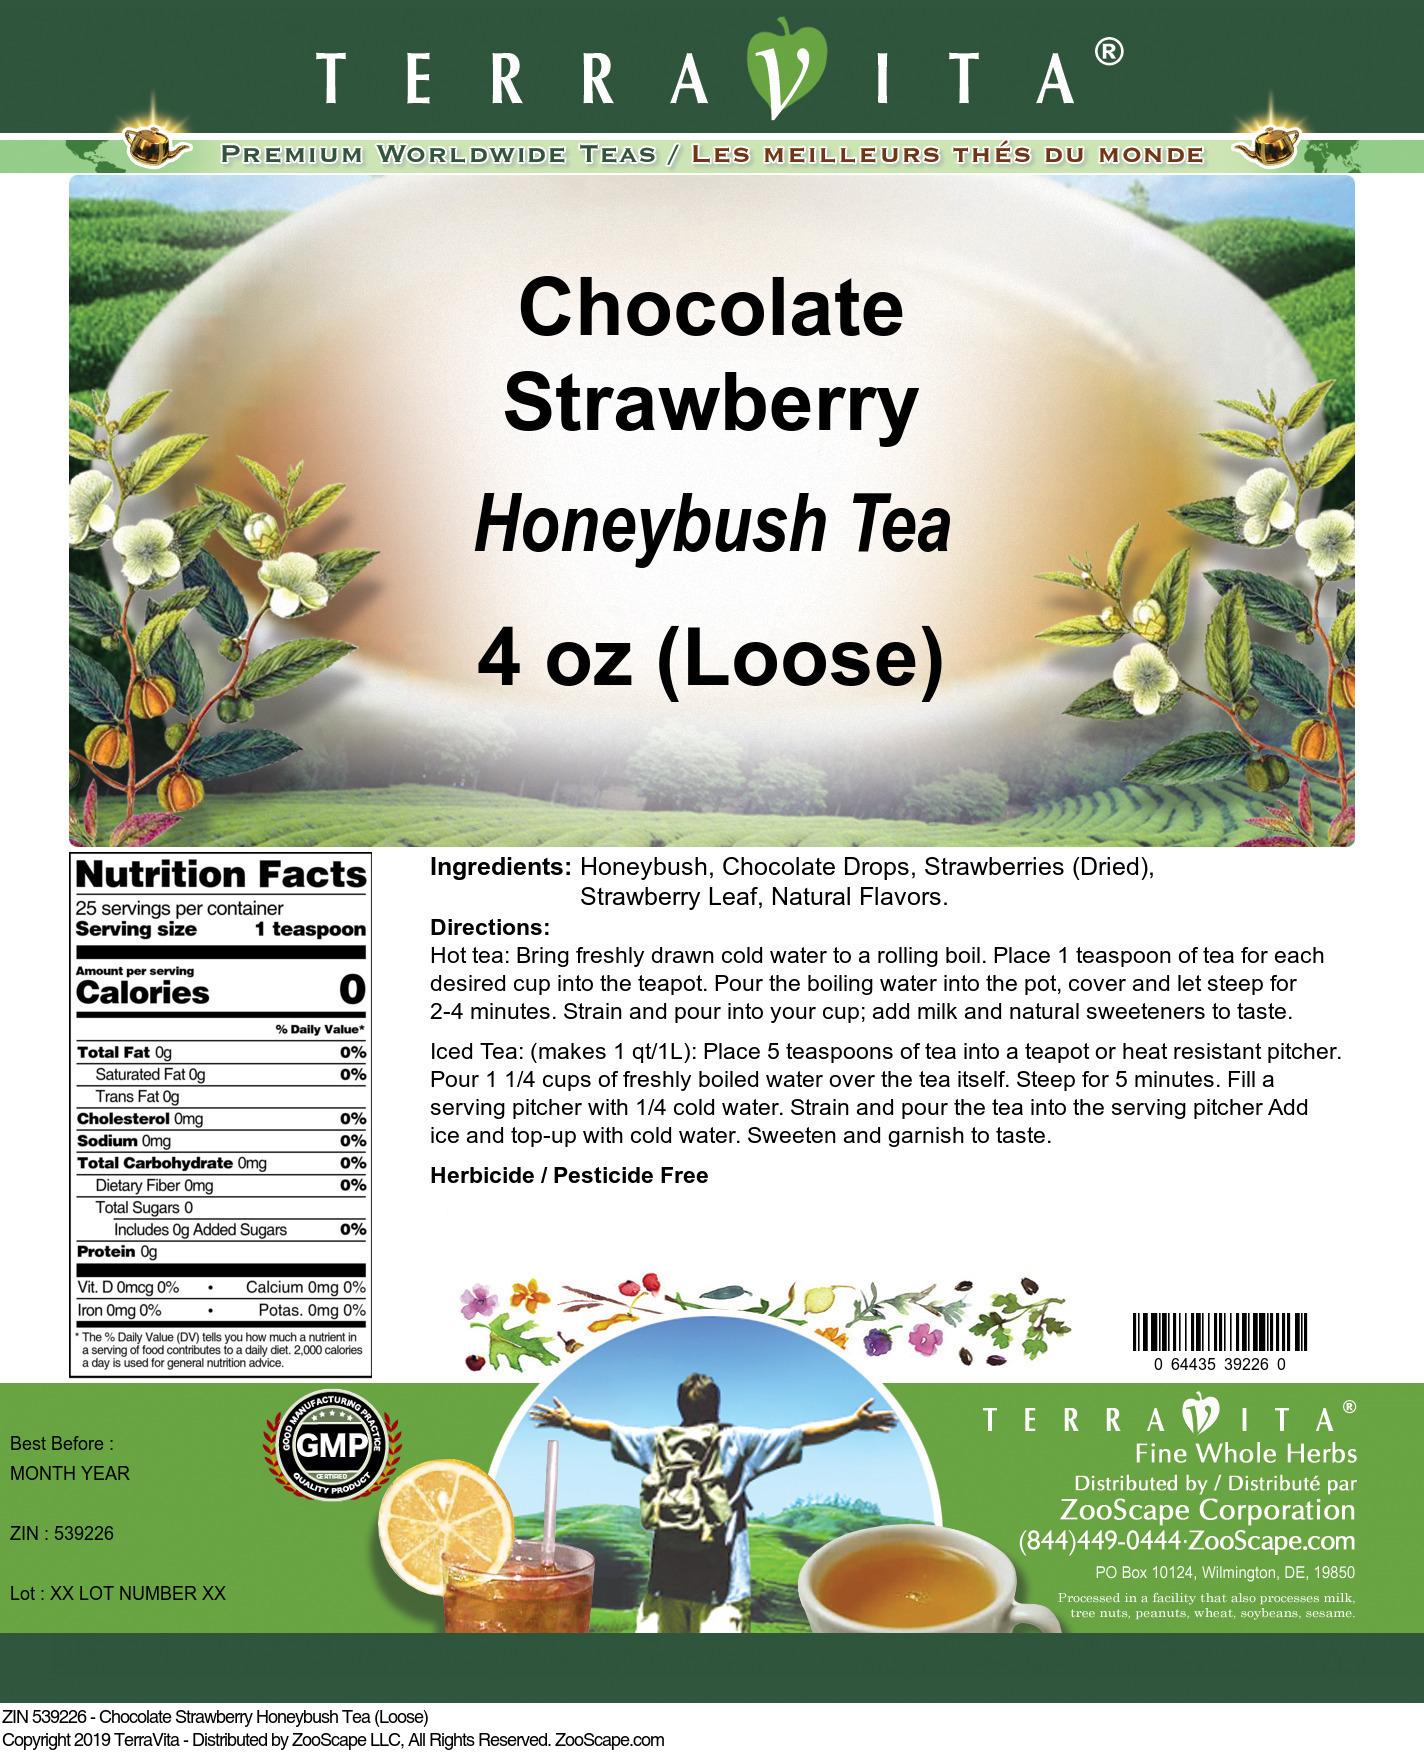 Chocolate Strawberry Honeybush Tea (Loose)